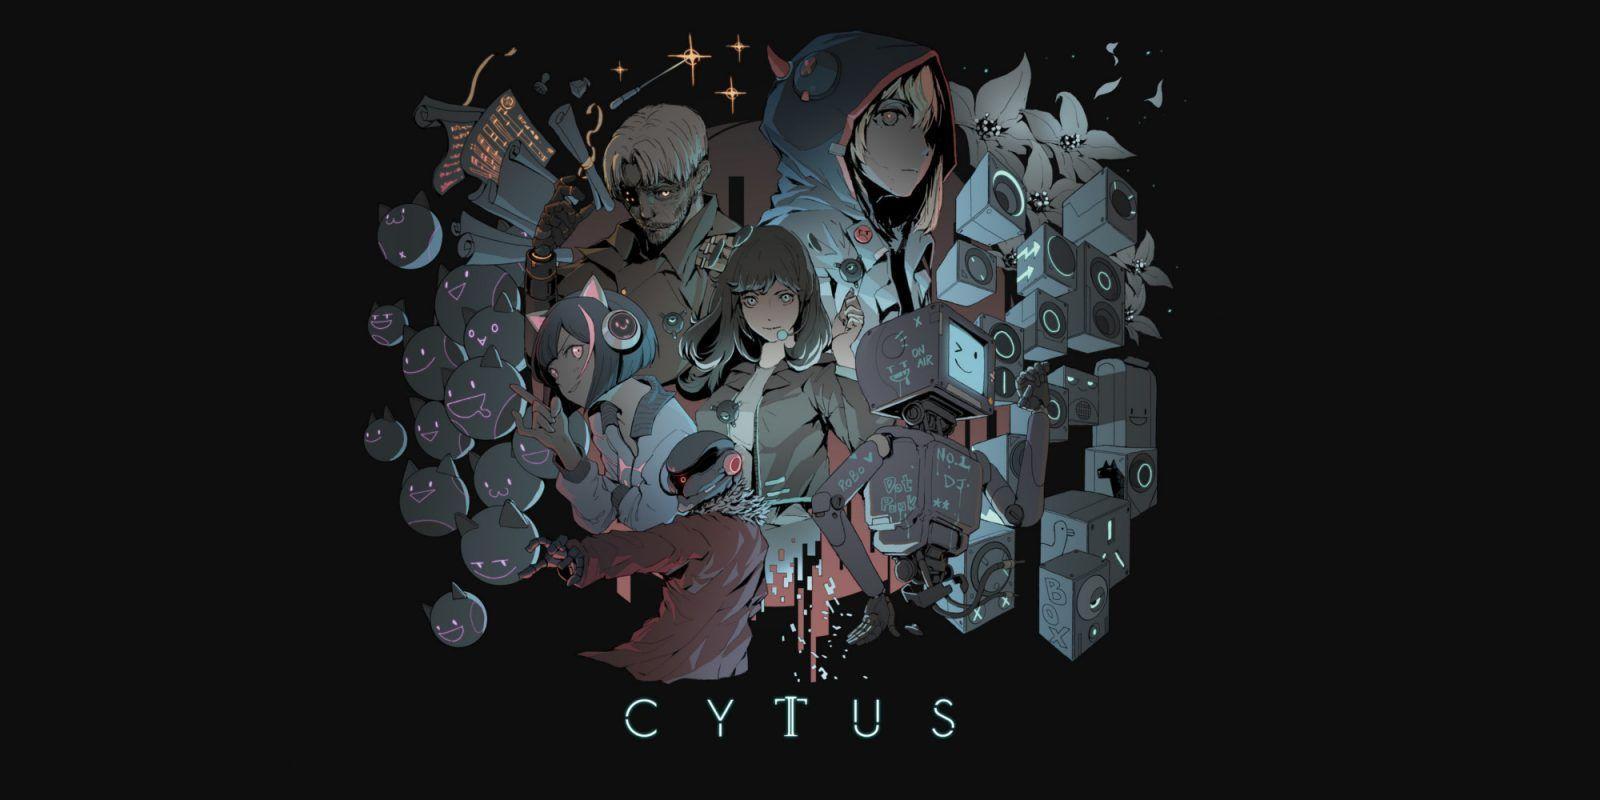 Cytus 2 Wallpapers Top Free Cytus 2 Backgrounds Wallpaperaccess